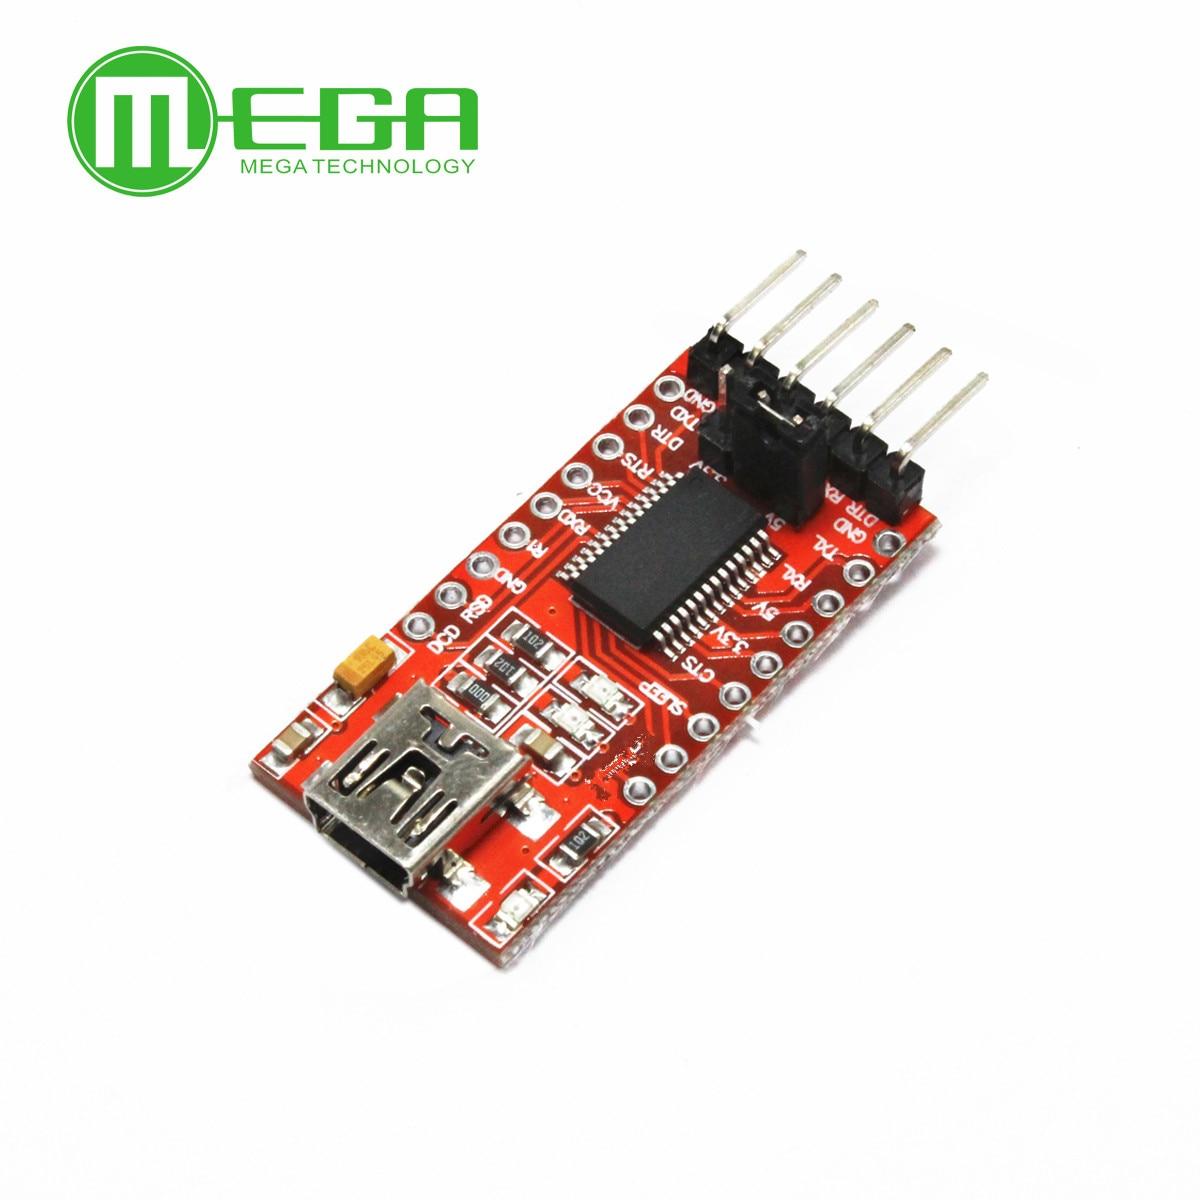 1pcs, FT232RL FT232 FTDI USB 3.3V 5.5V To TTL Serial Adapter Module For A-rduino Mini Port